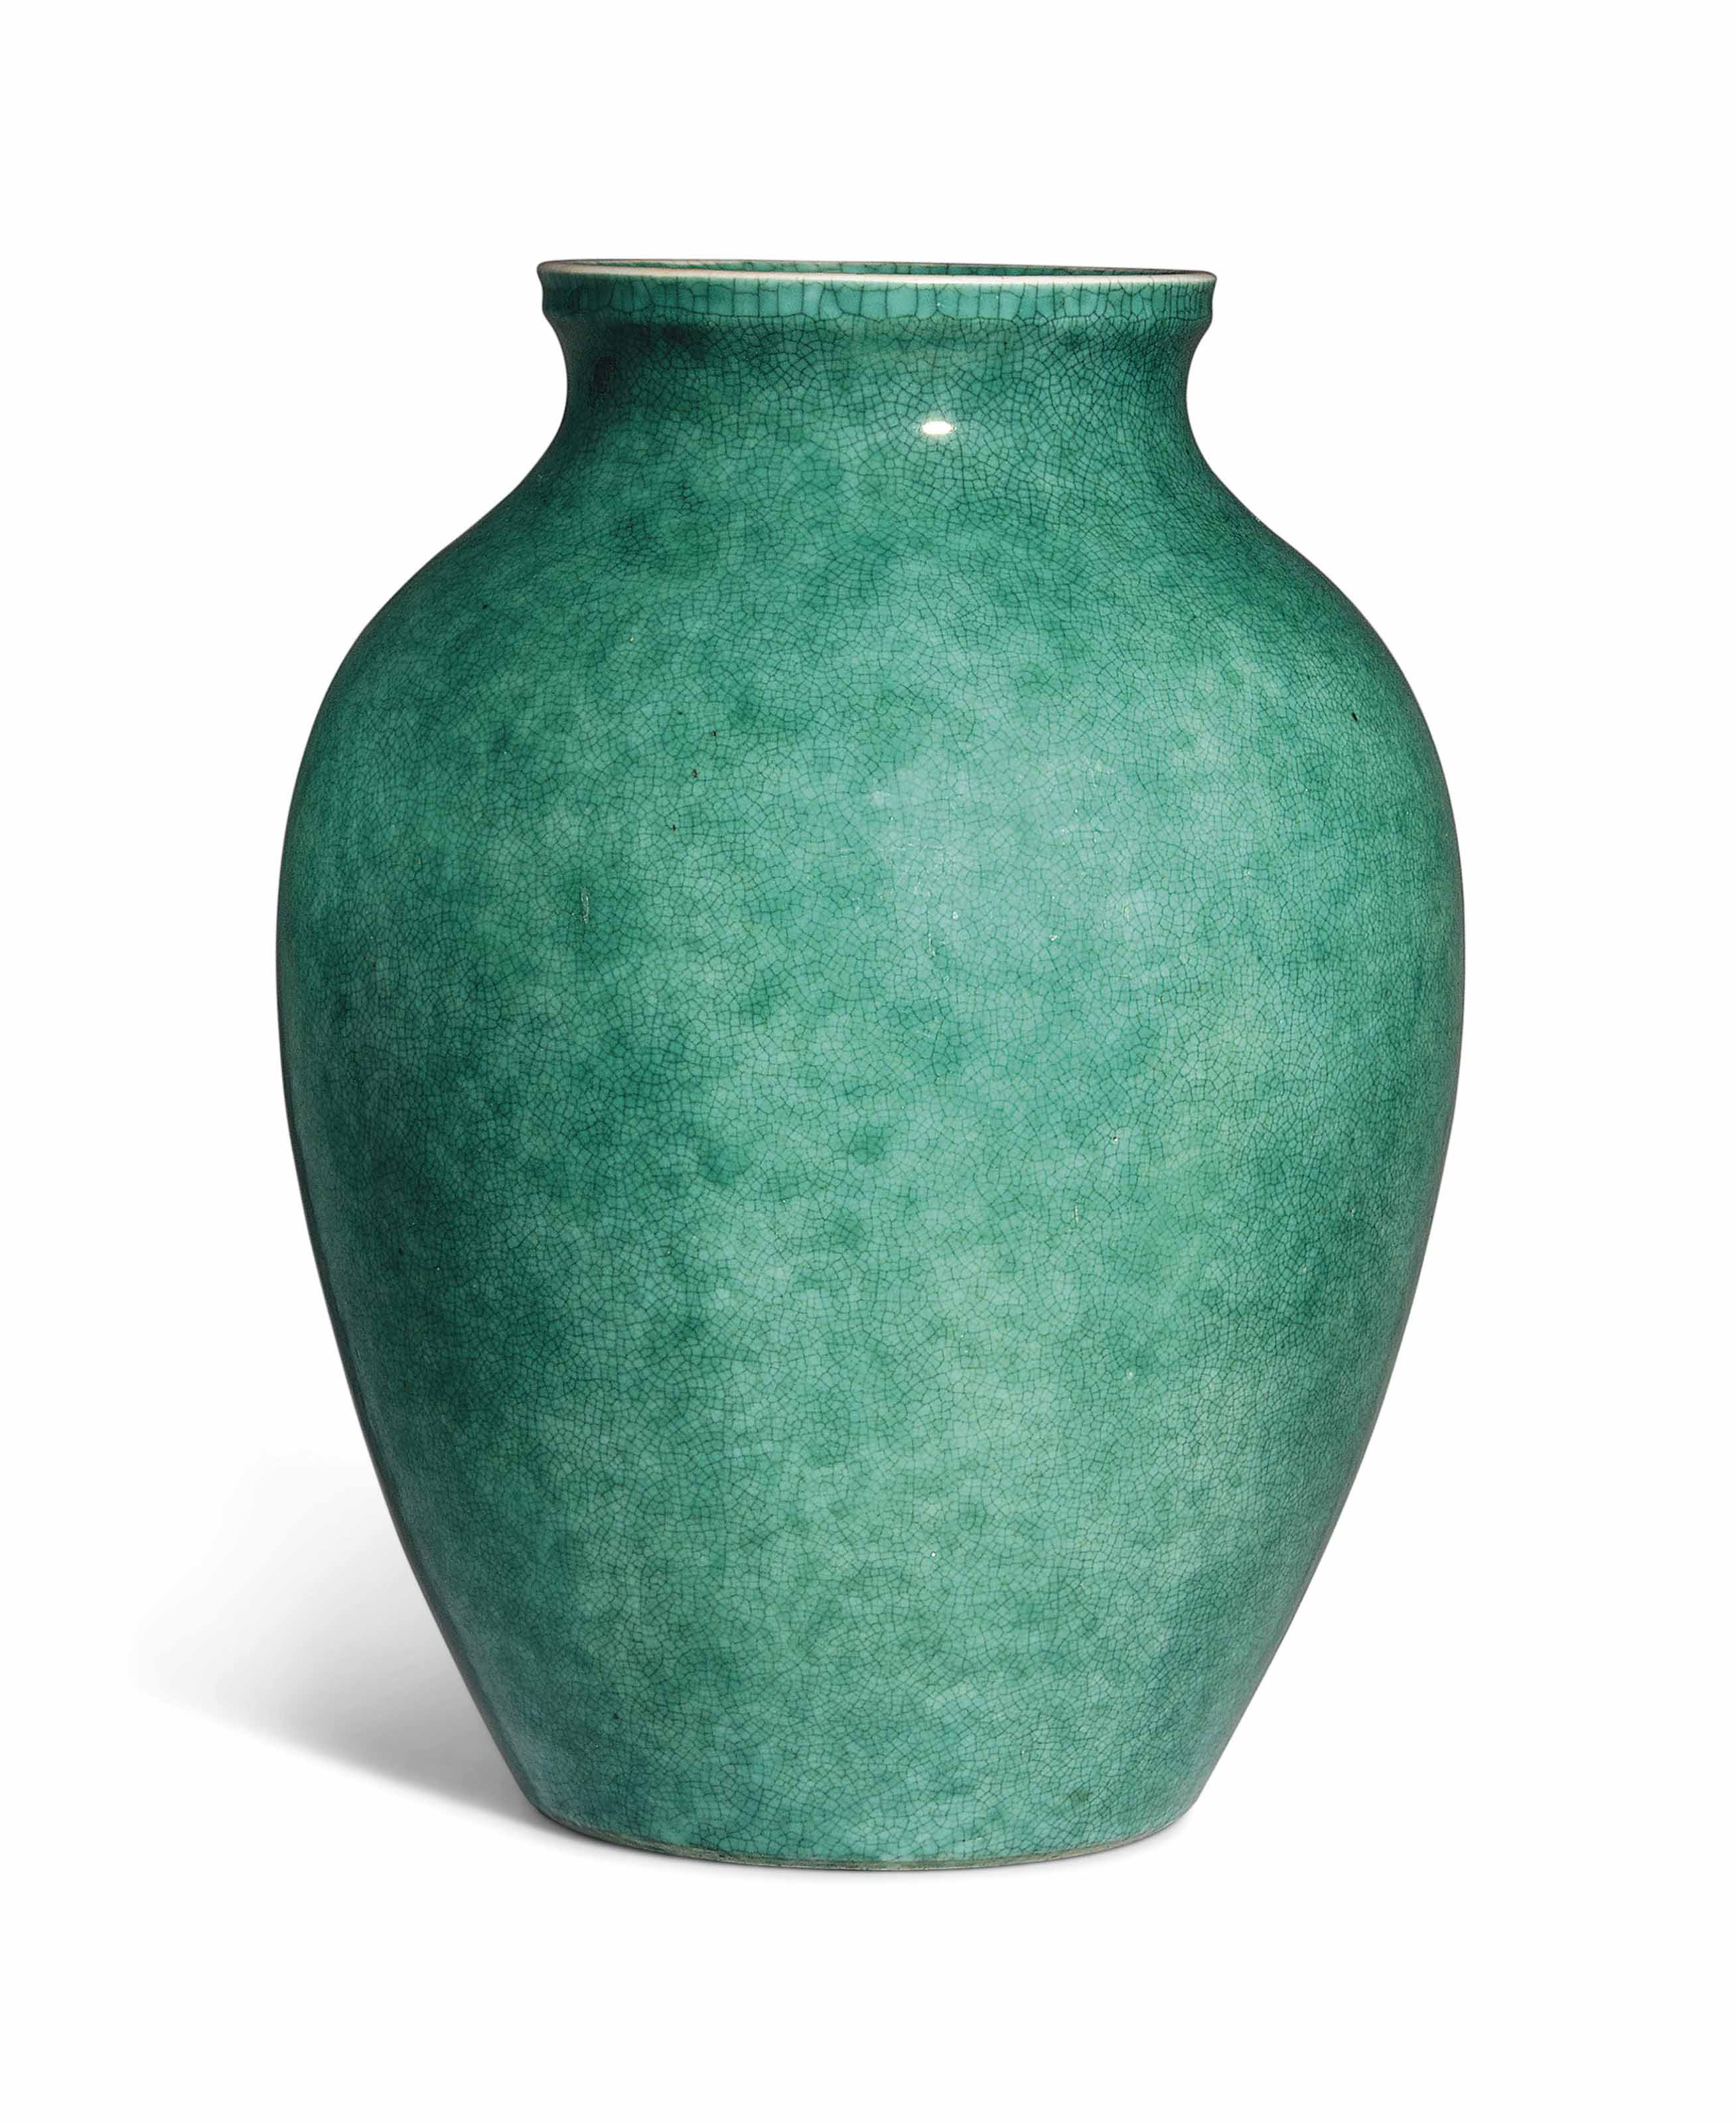 AN APPLE-GREEN-GLAZED JAR